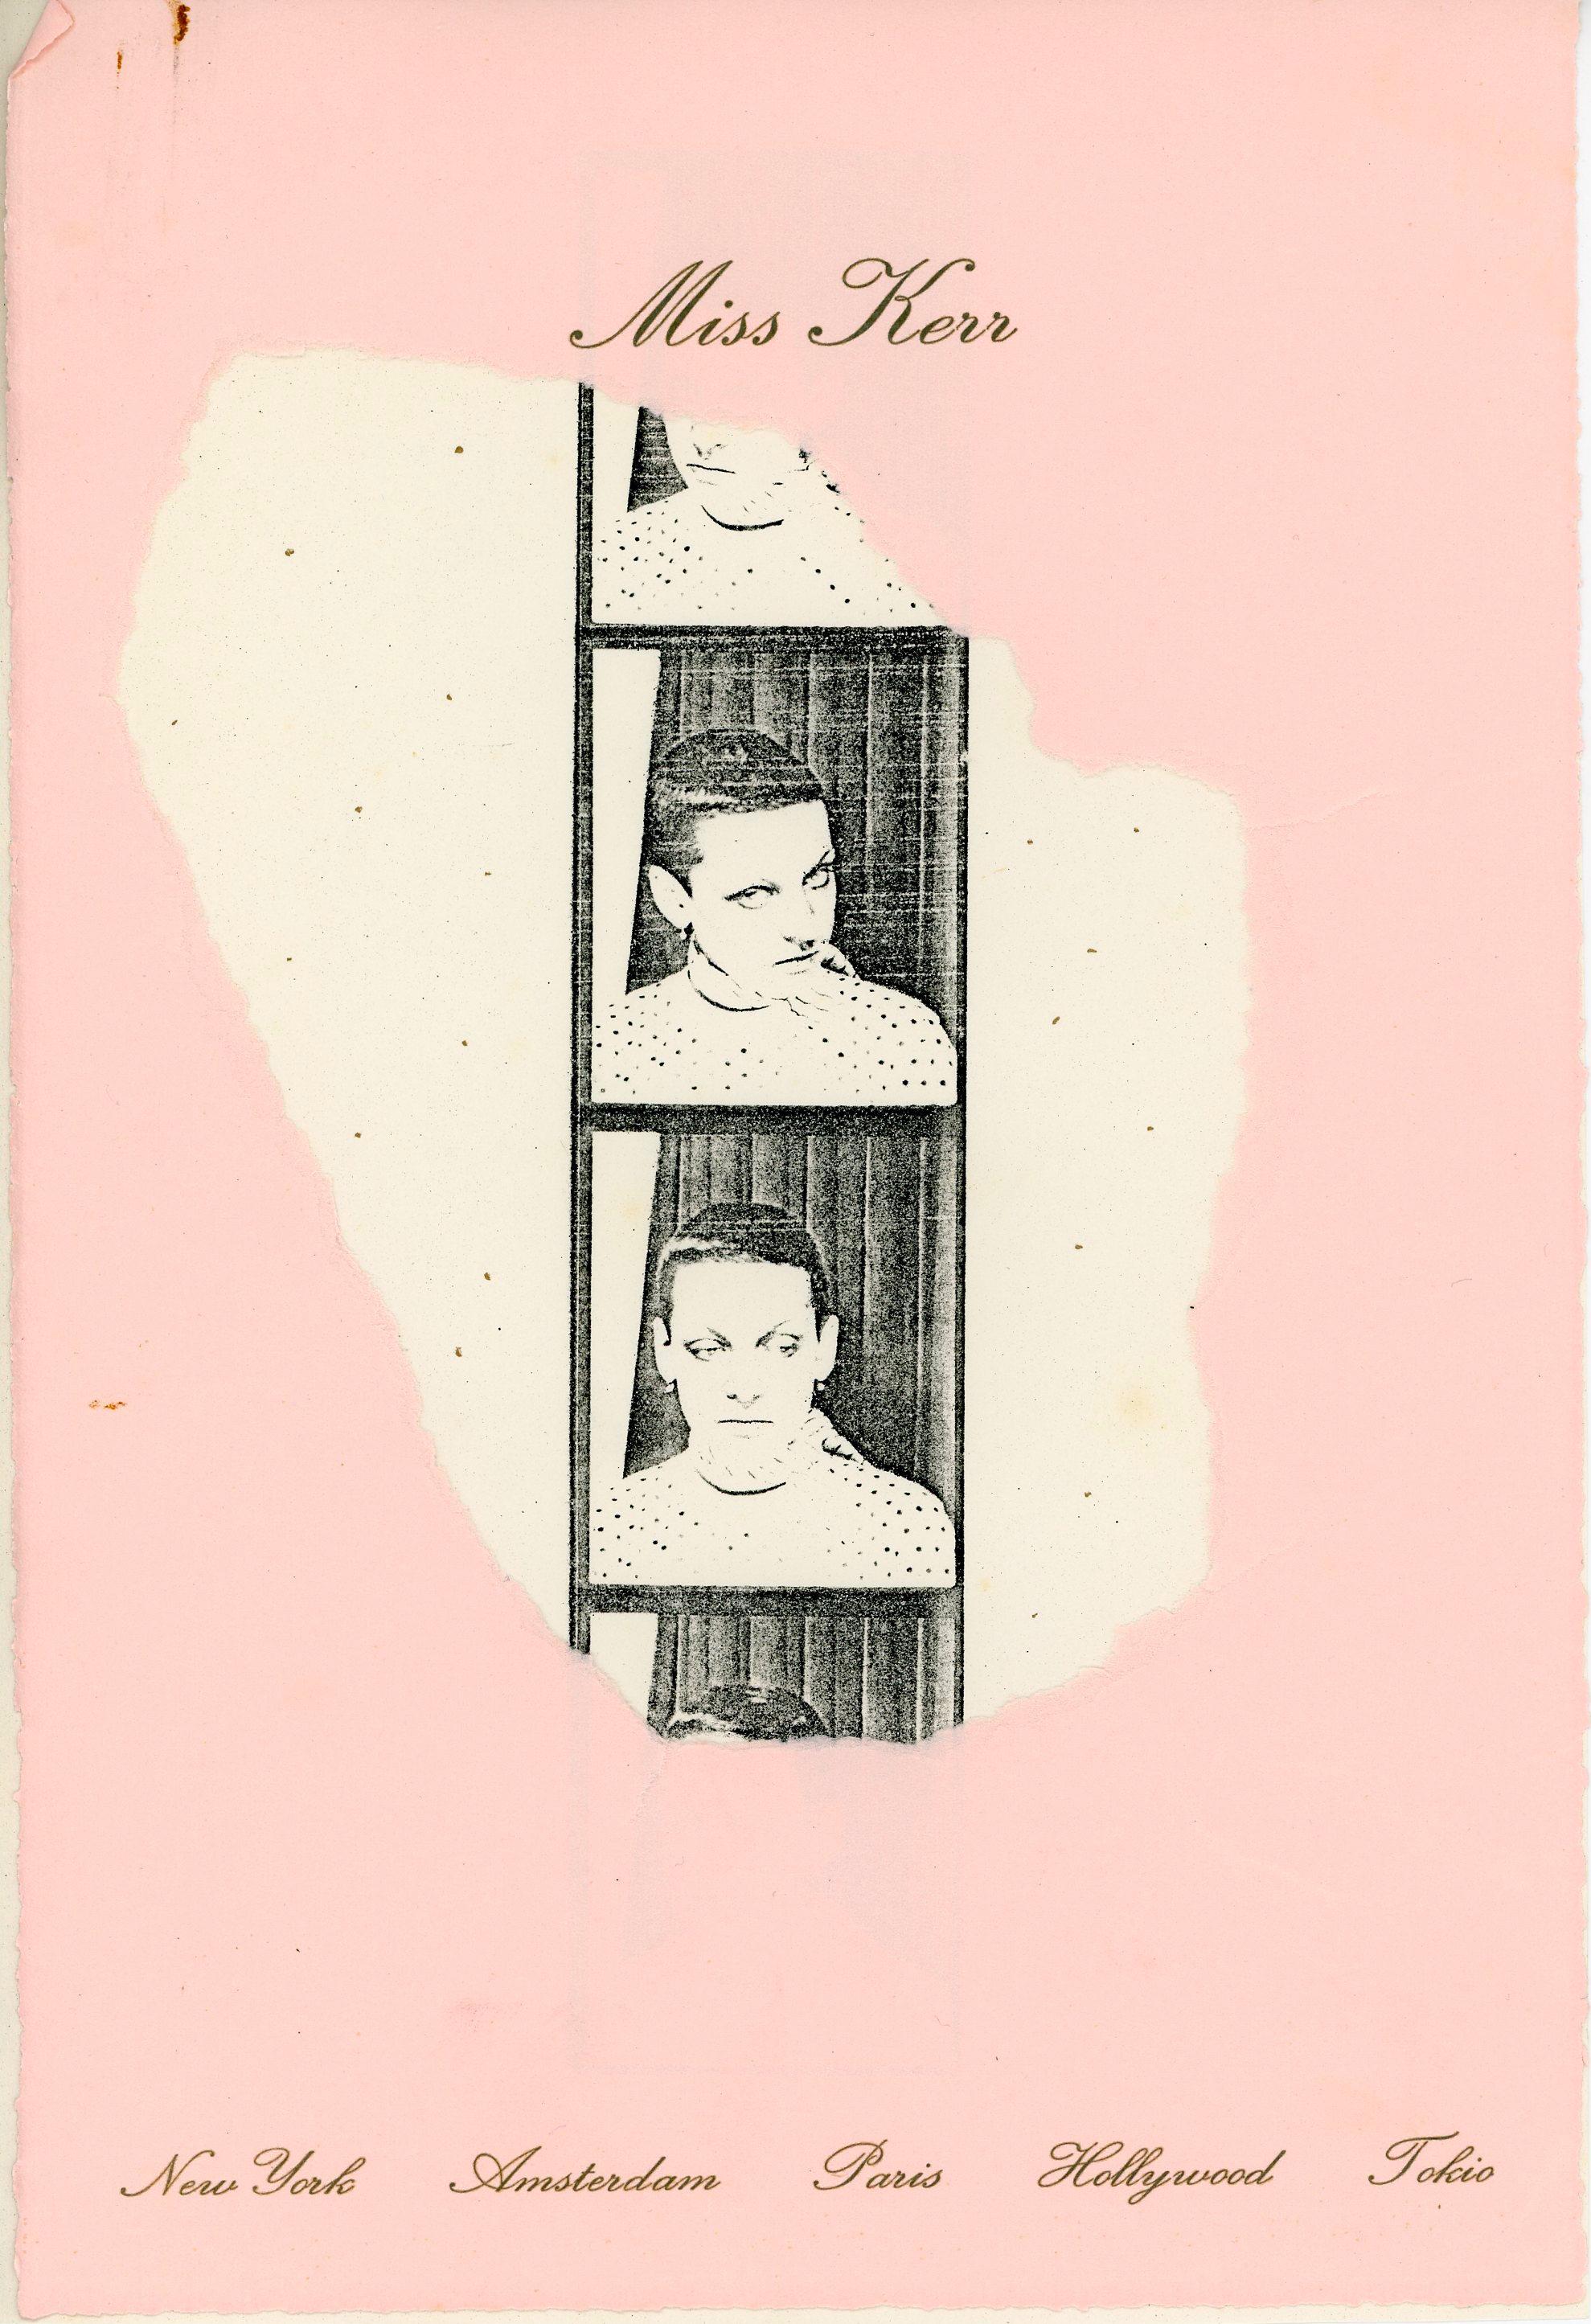 Miss Kerr stationary, 1977